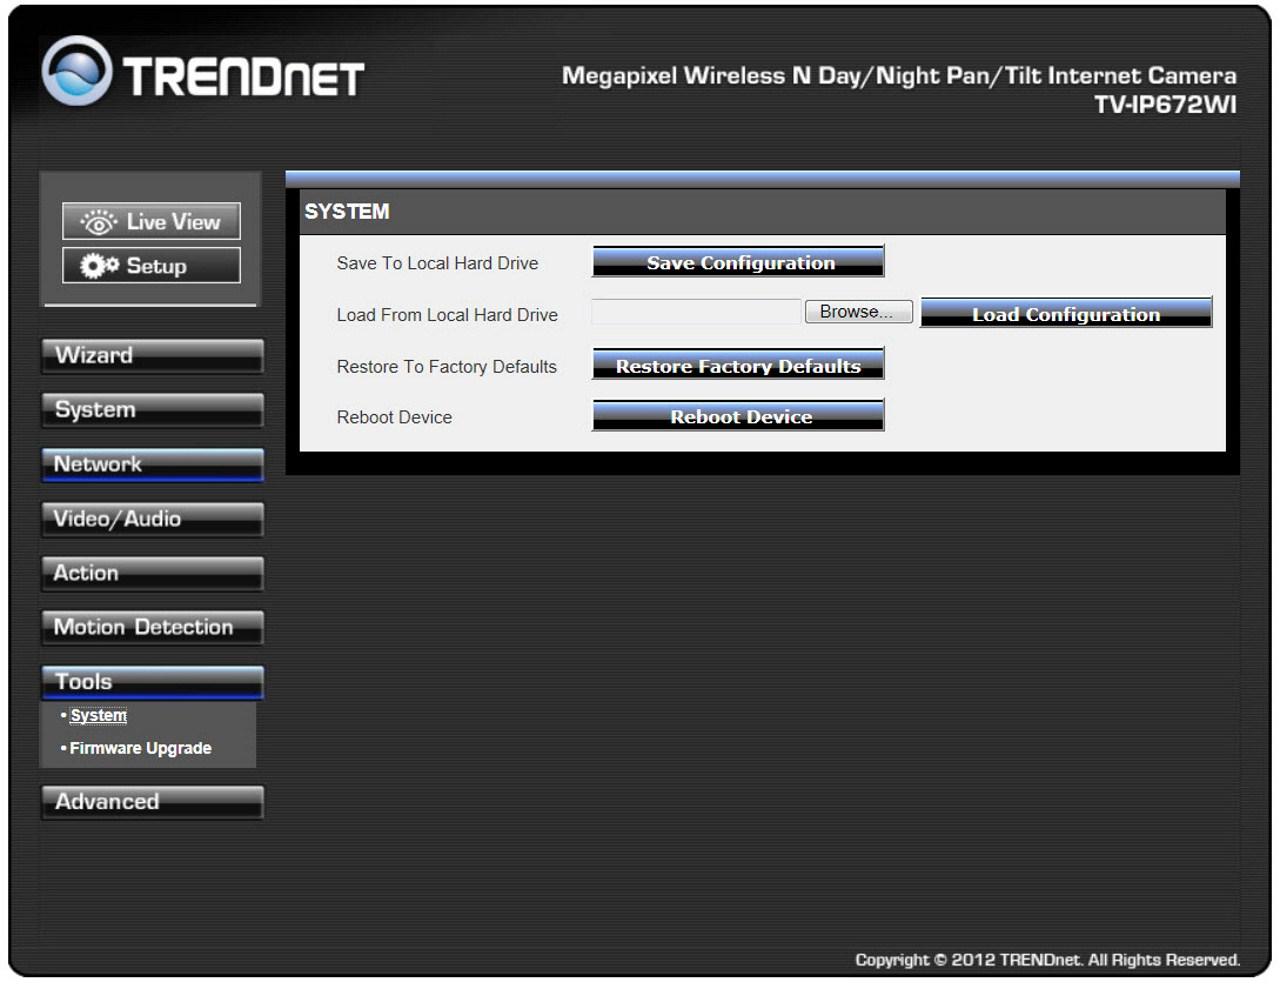 TRENDnet TV-IP672WI Megapixel Wireless Day/Night PTZ IP